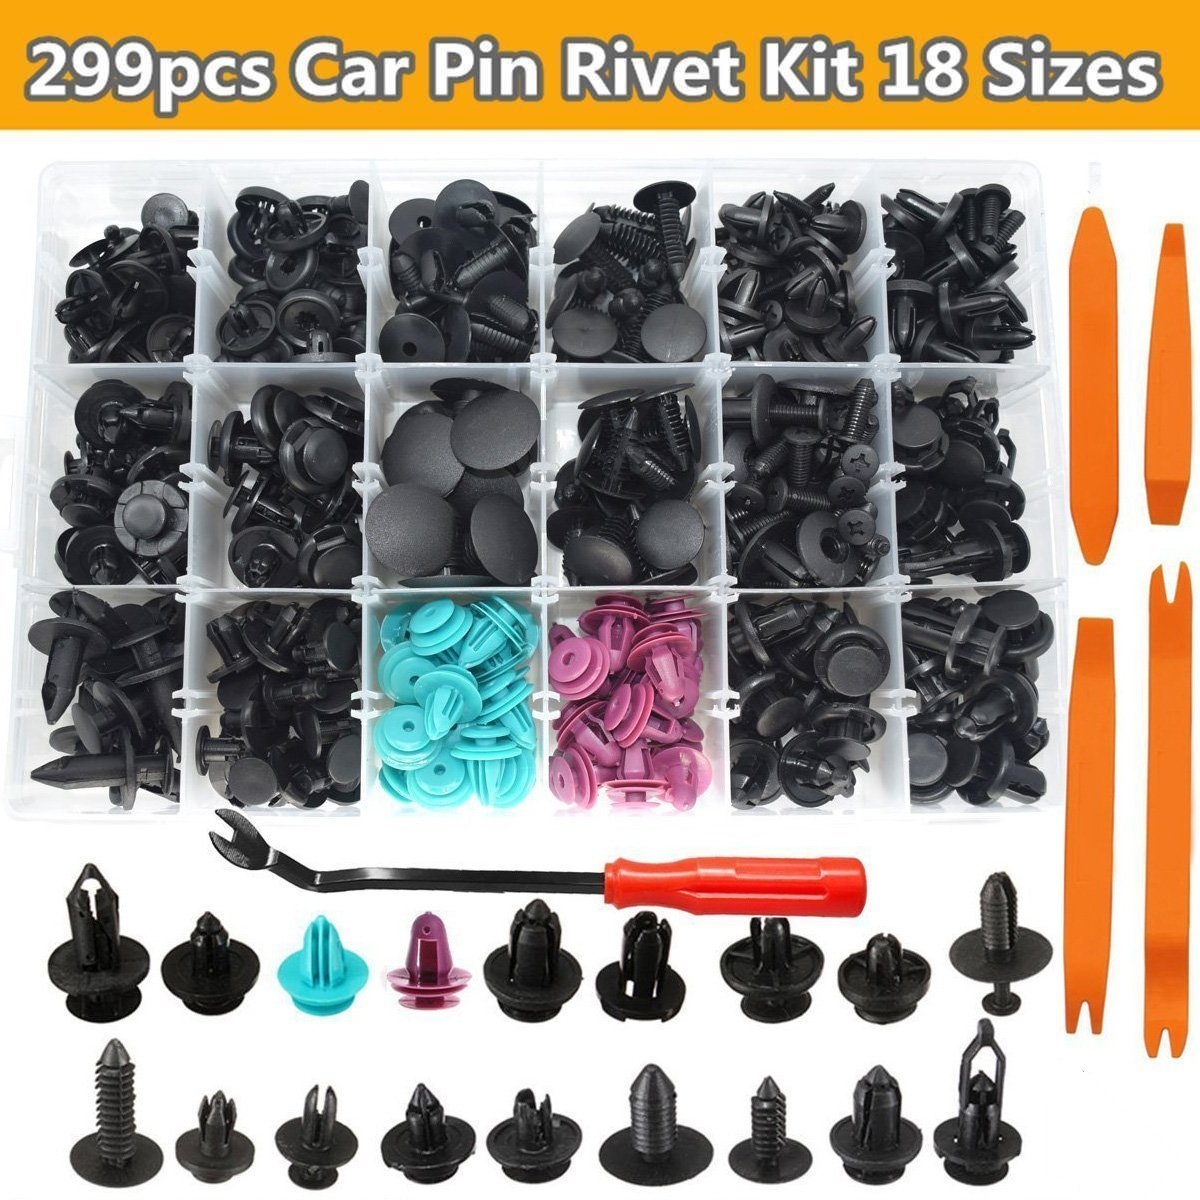 CNIKESIN 555Pcs Automotive Plastic Rivets Kit Bumper Clip Fasteners Push Retainer Kit Fender Trim Clips with 5Pcs Car Trim Molding Removal Tool Kit for Toyota Honda Lexus All car